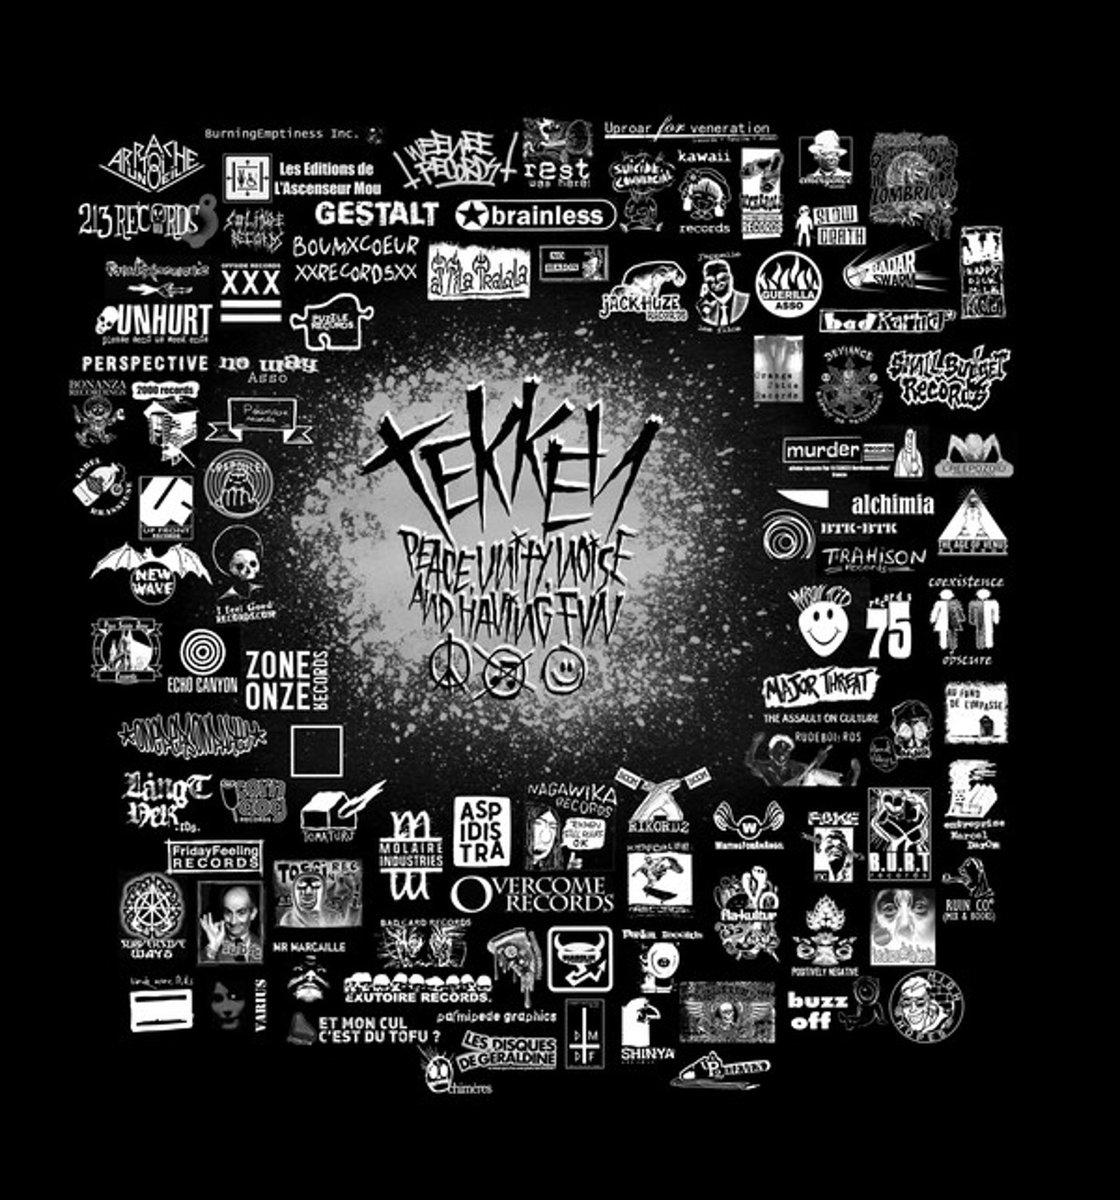 tekken - peace, unity, noise and having fun compilation LP + CD